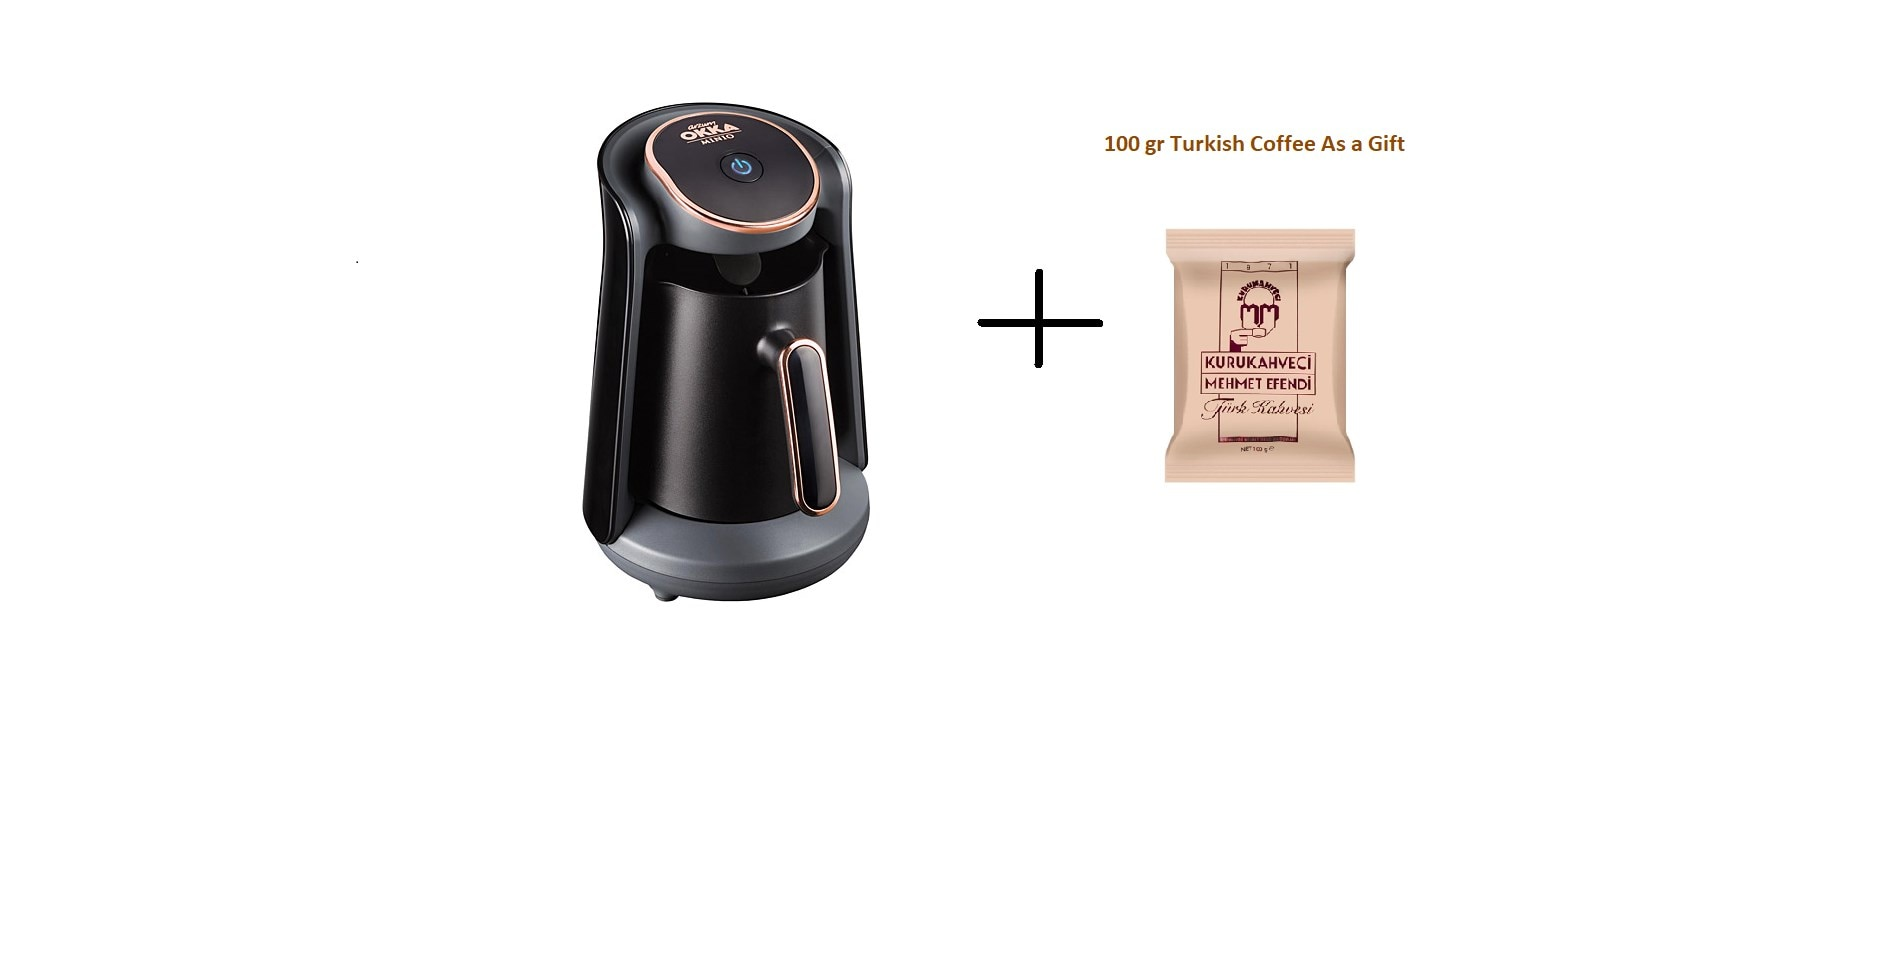 220V 300ML Electric Automatic Stainless Steel Coffee Machine Turkish Greek Coffee Maker Tea Moka Pot Home Office Coffee